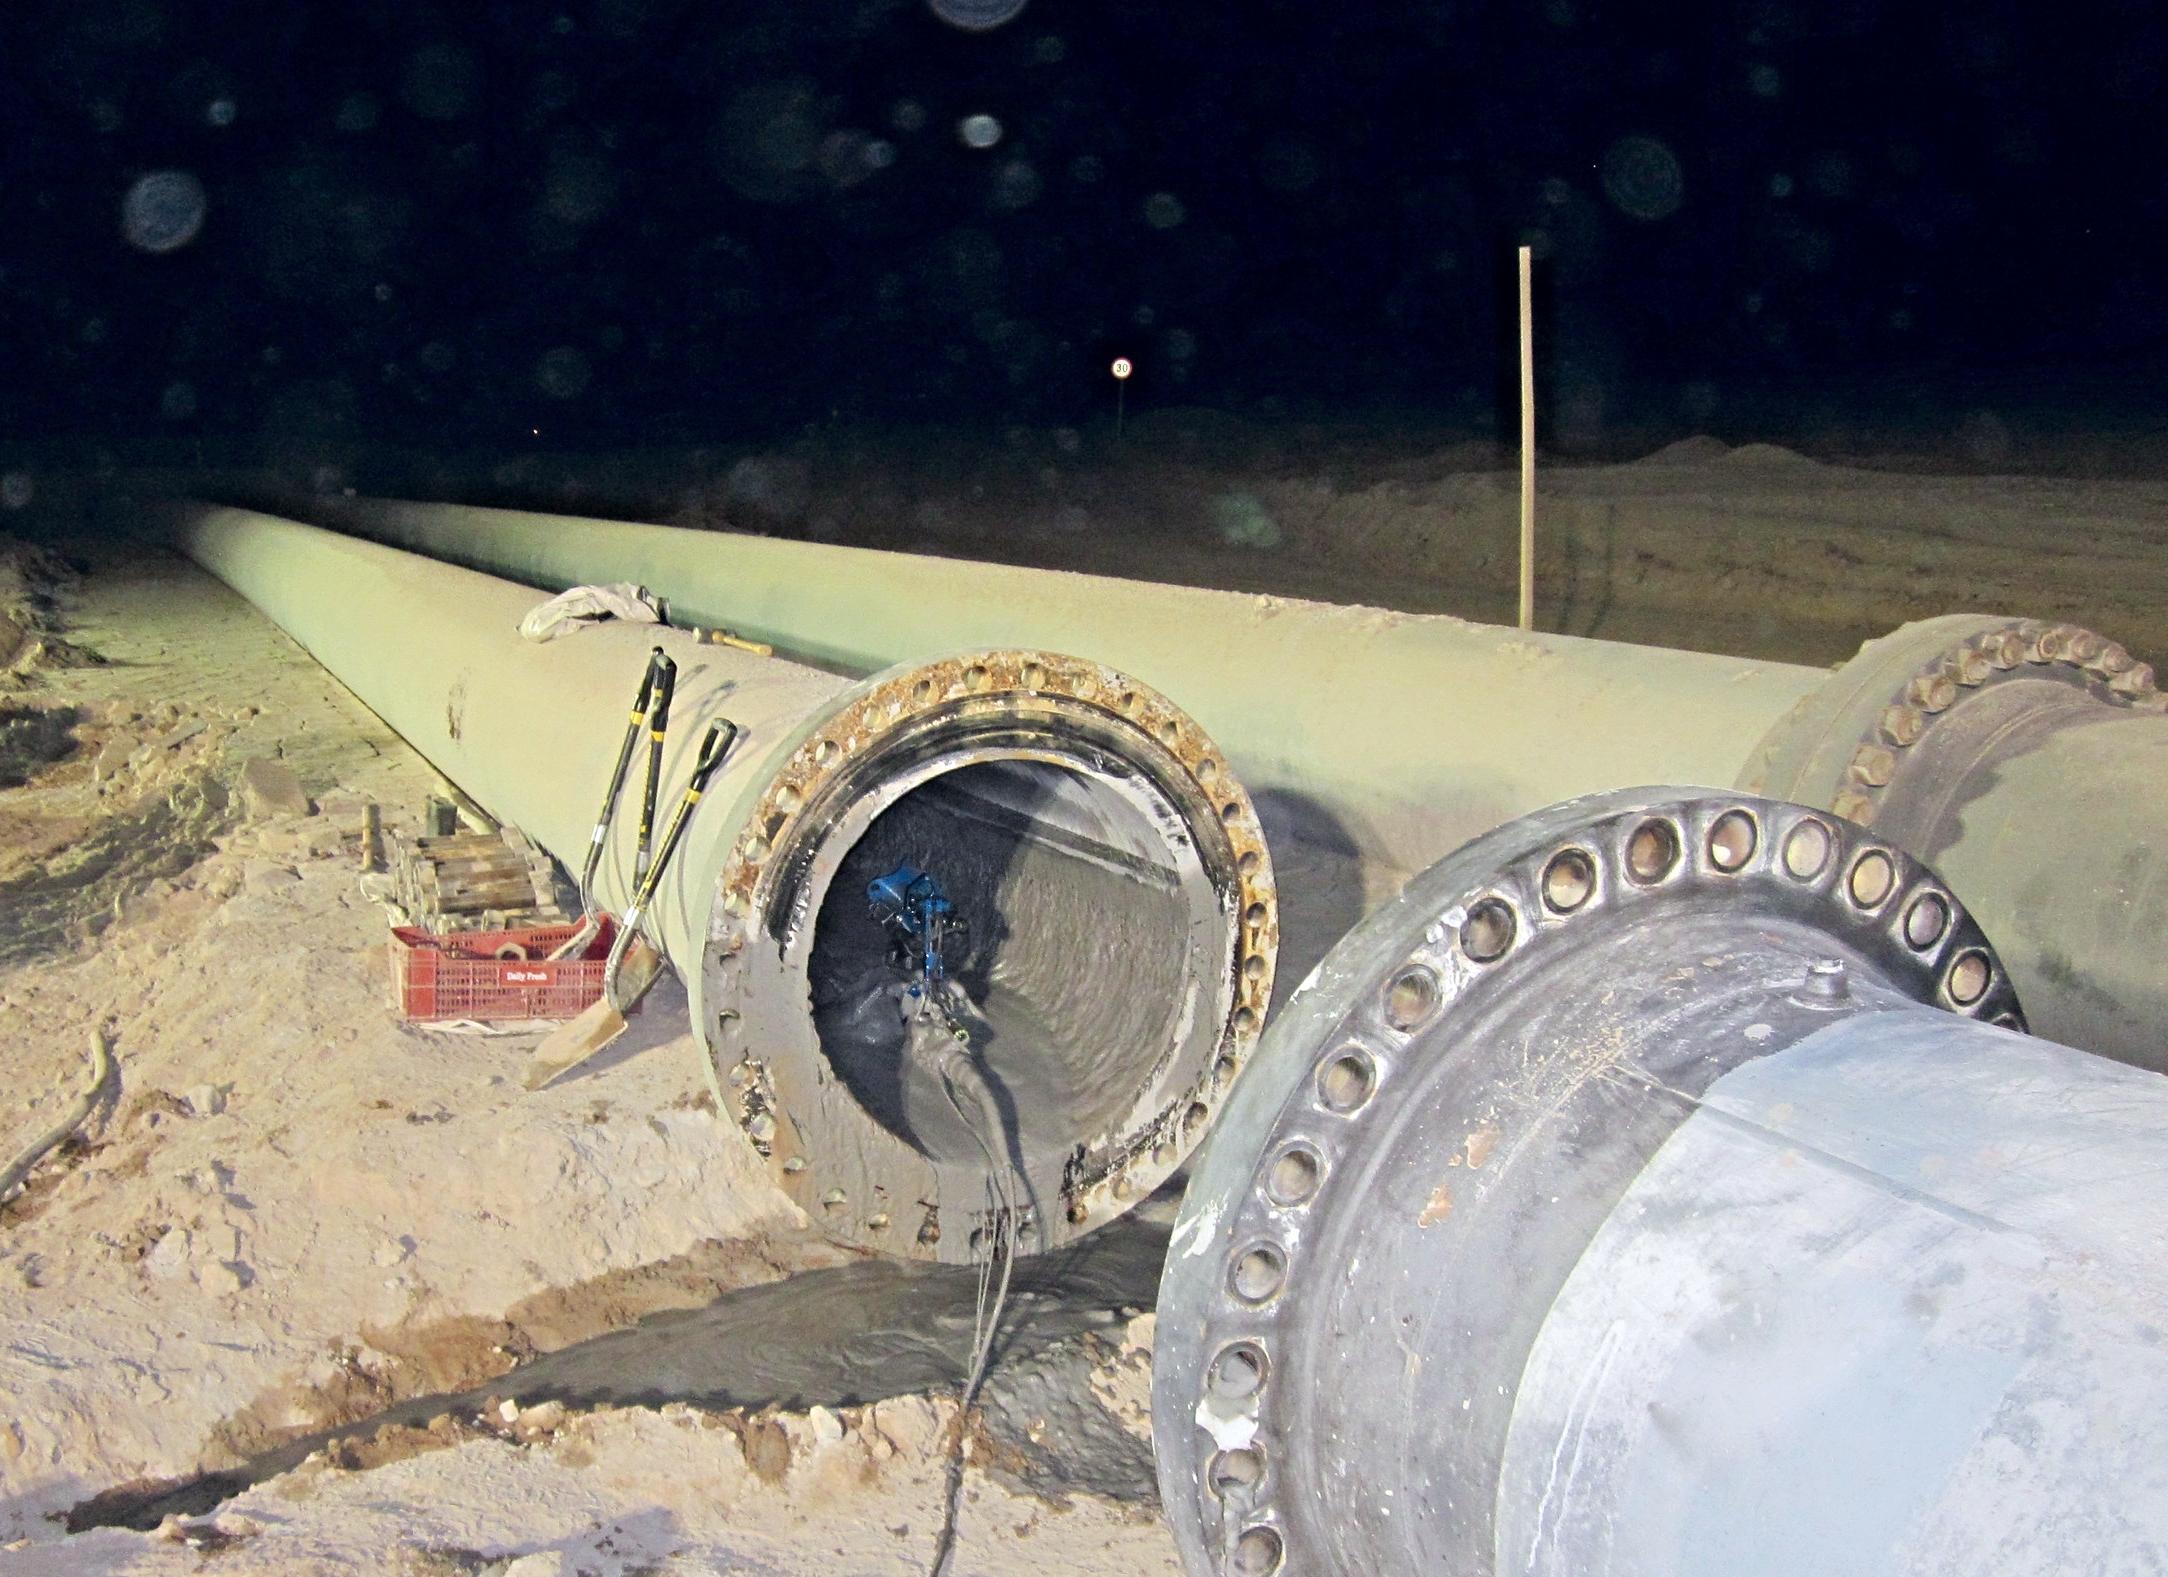 Versatrax 150 inspects Escondido mine pipeline